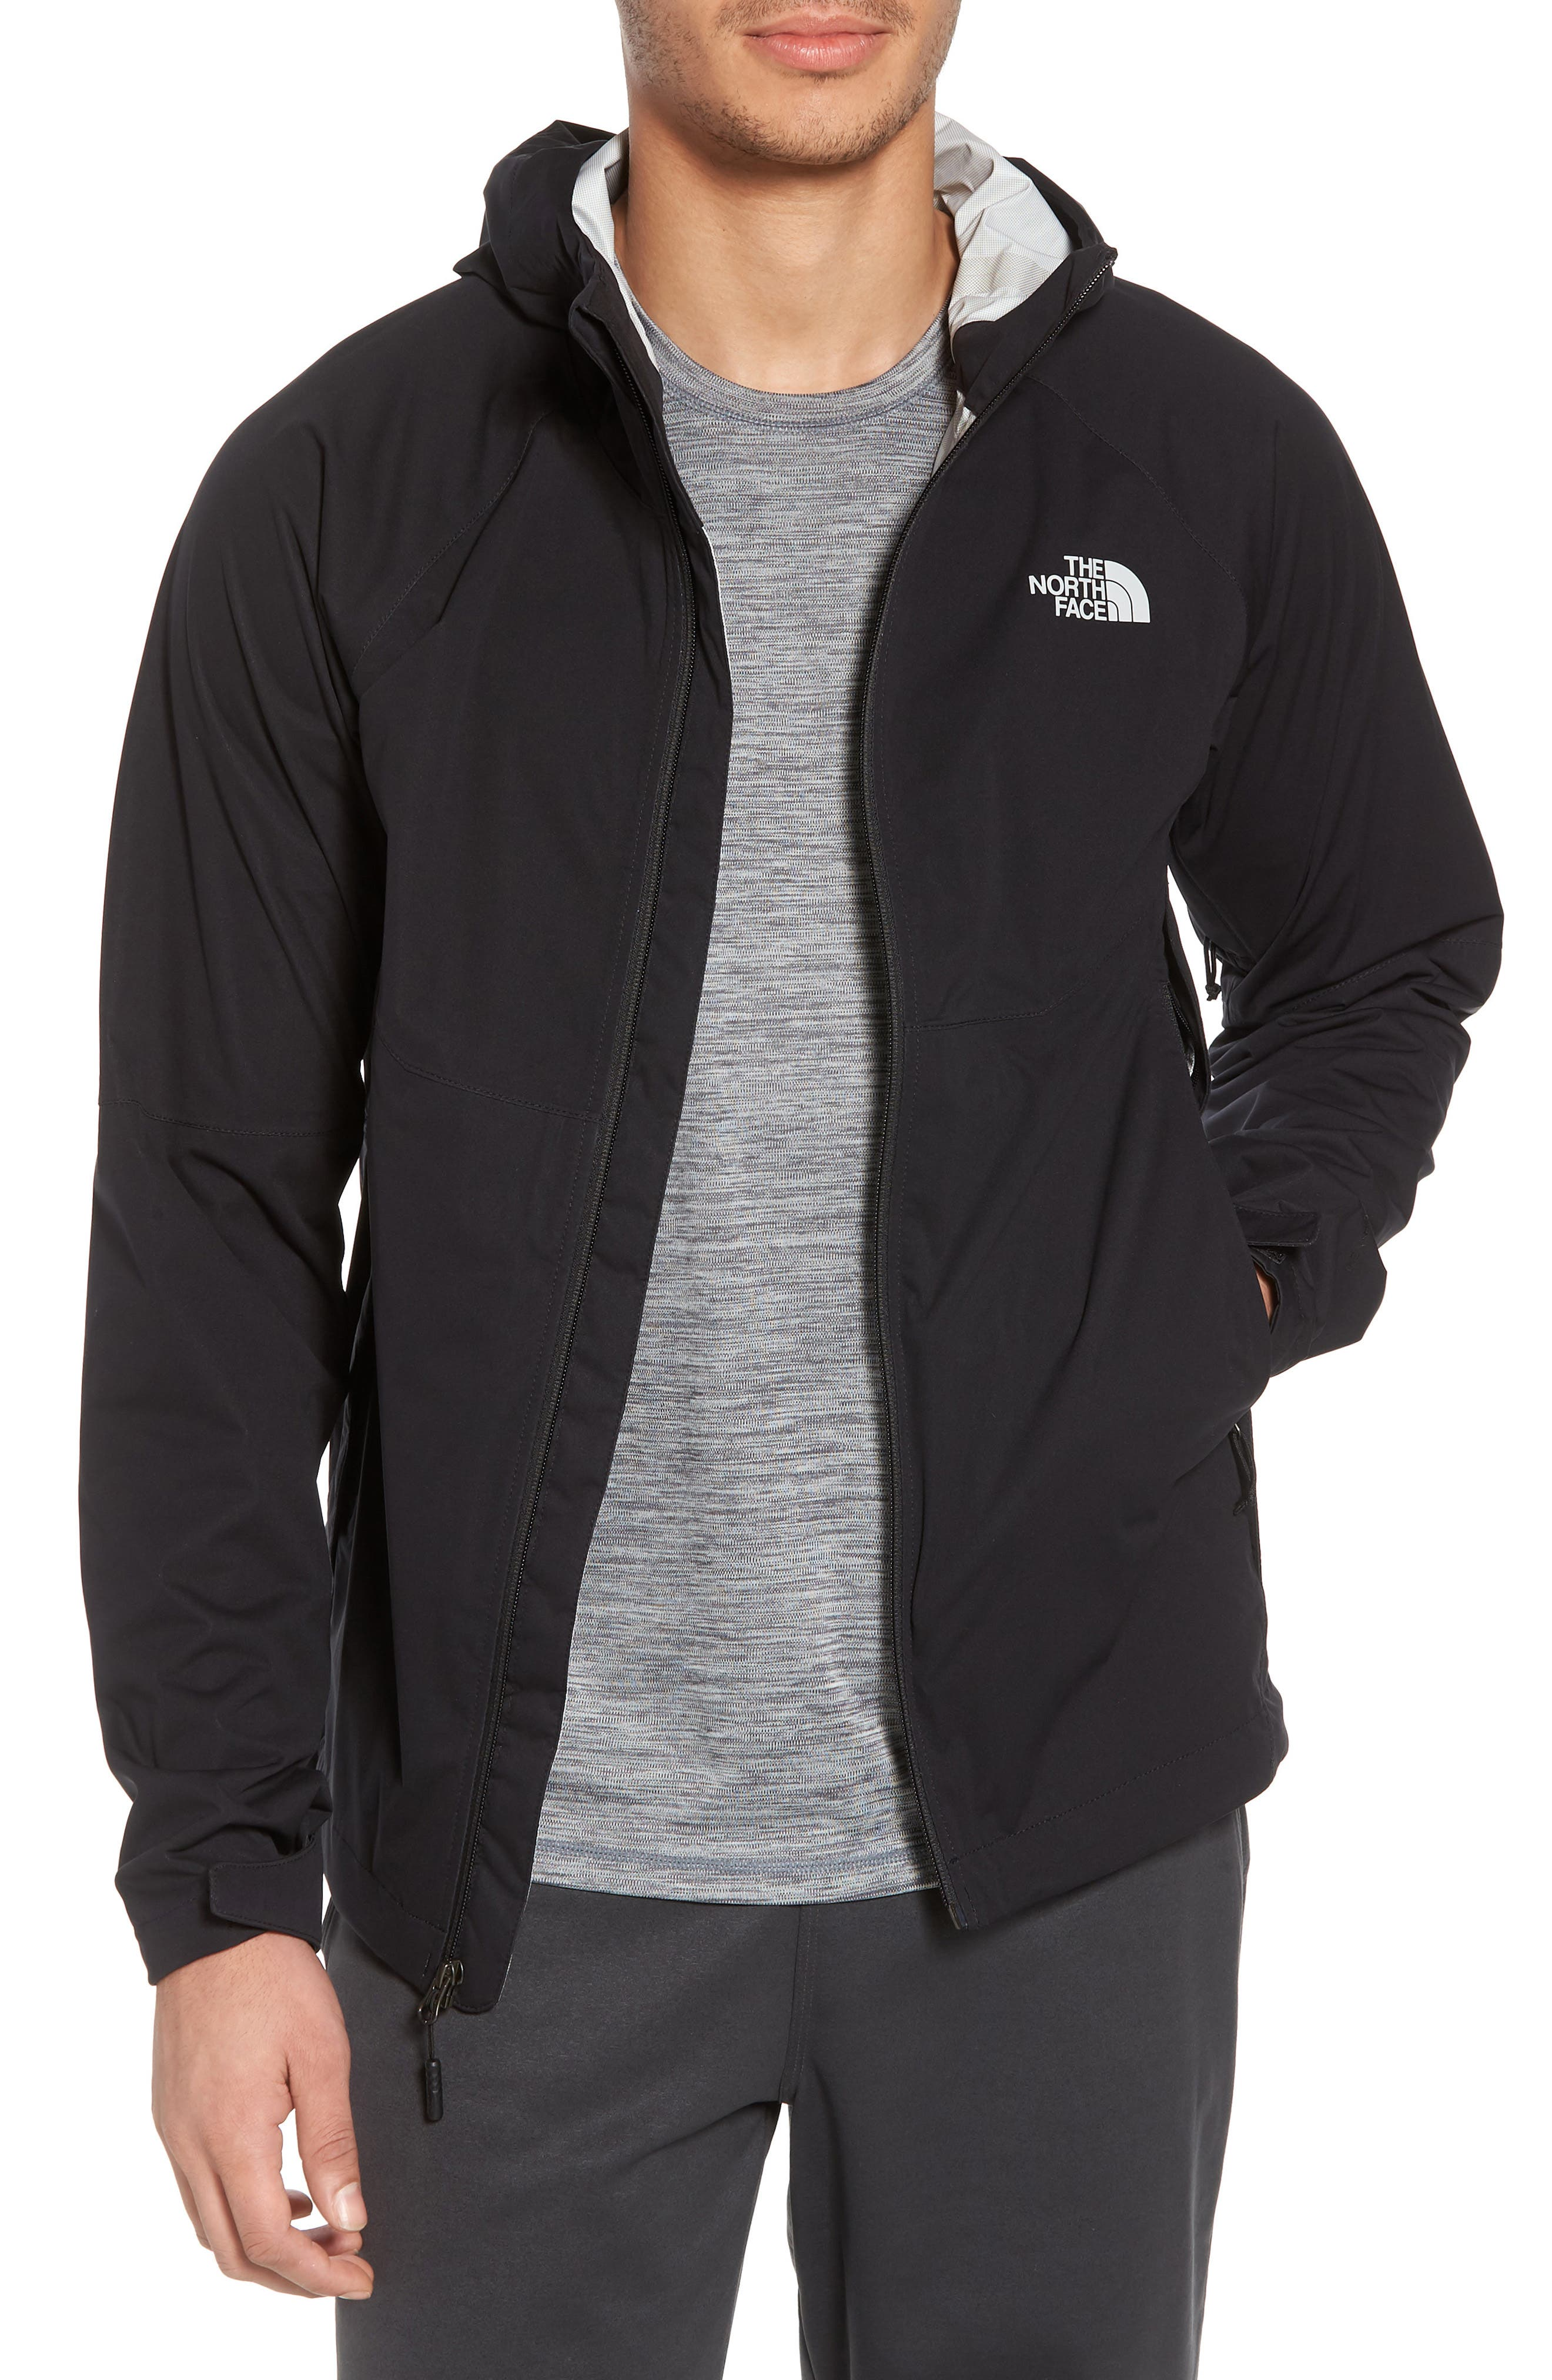 Allproof Stretch Hooded Rain Jacket,                             Main thumbnail 1, color,                             TNF BLACK